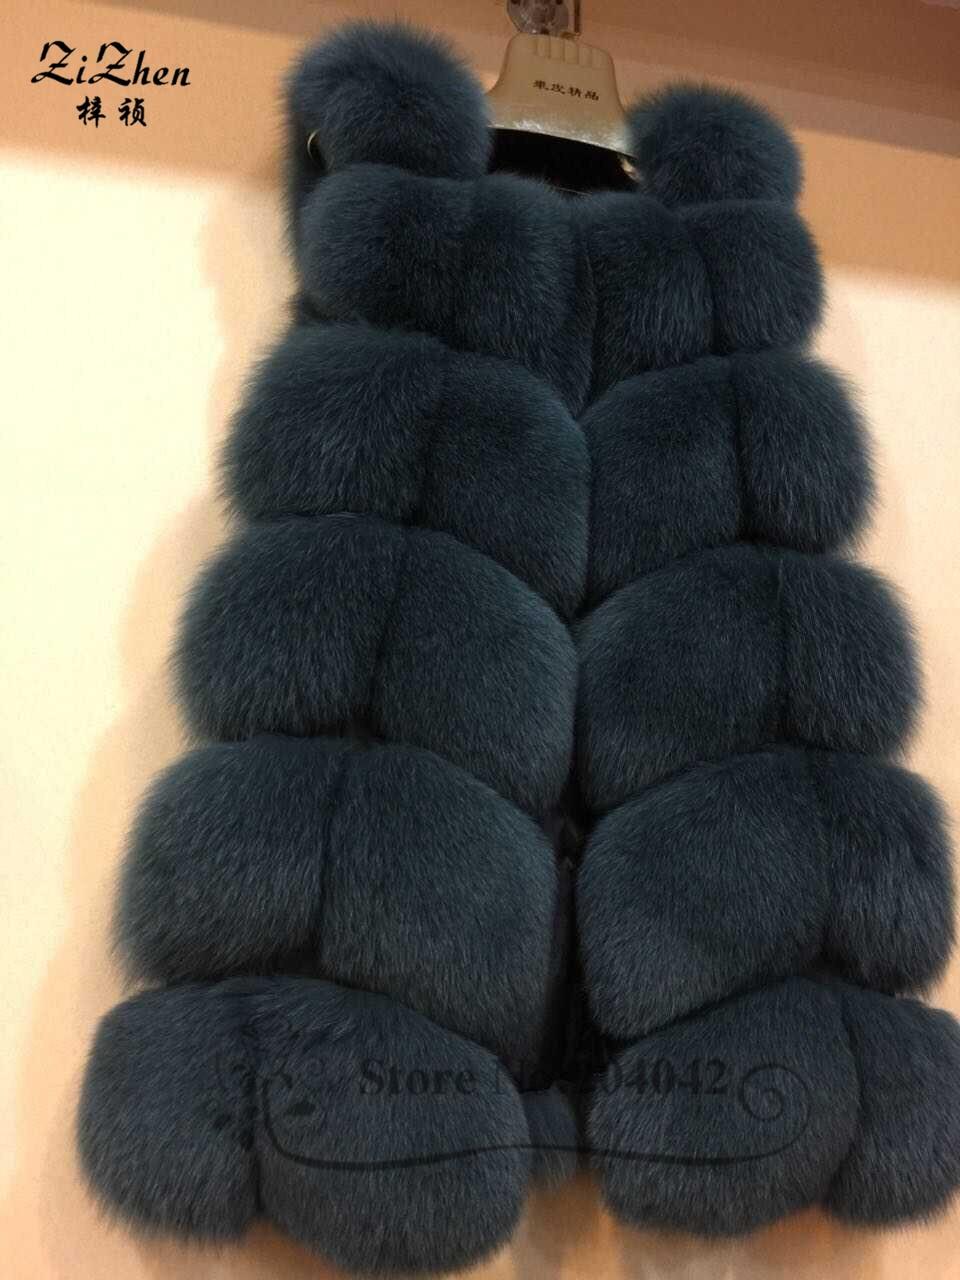 Zizhen winter echte fuchspelz weste frauen volle fell weste warme - Damenbekleidung - Foto 4